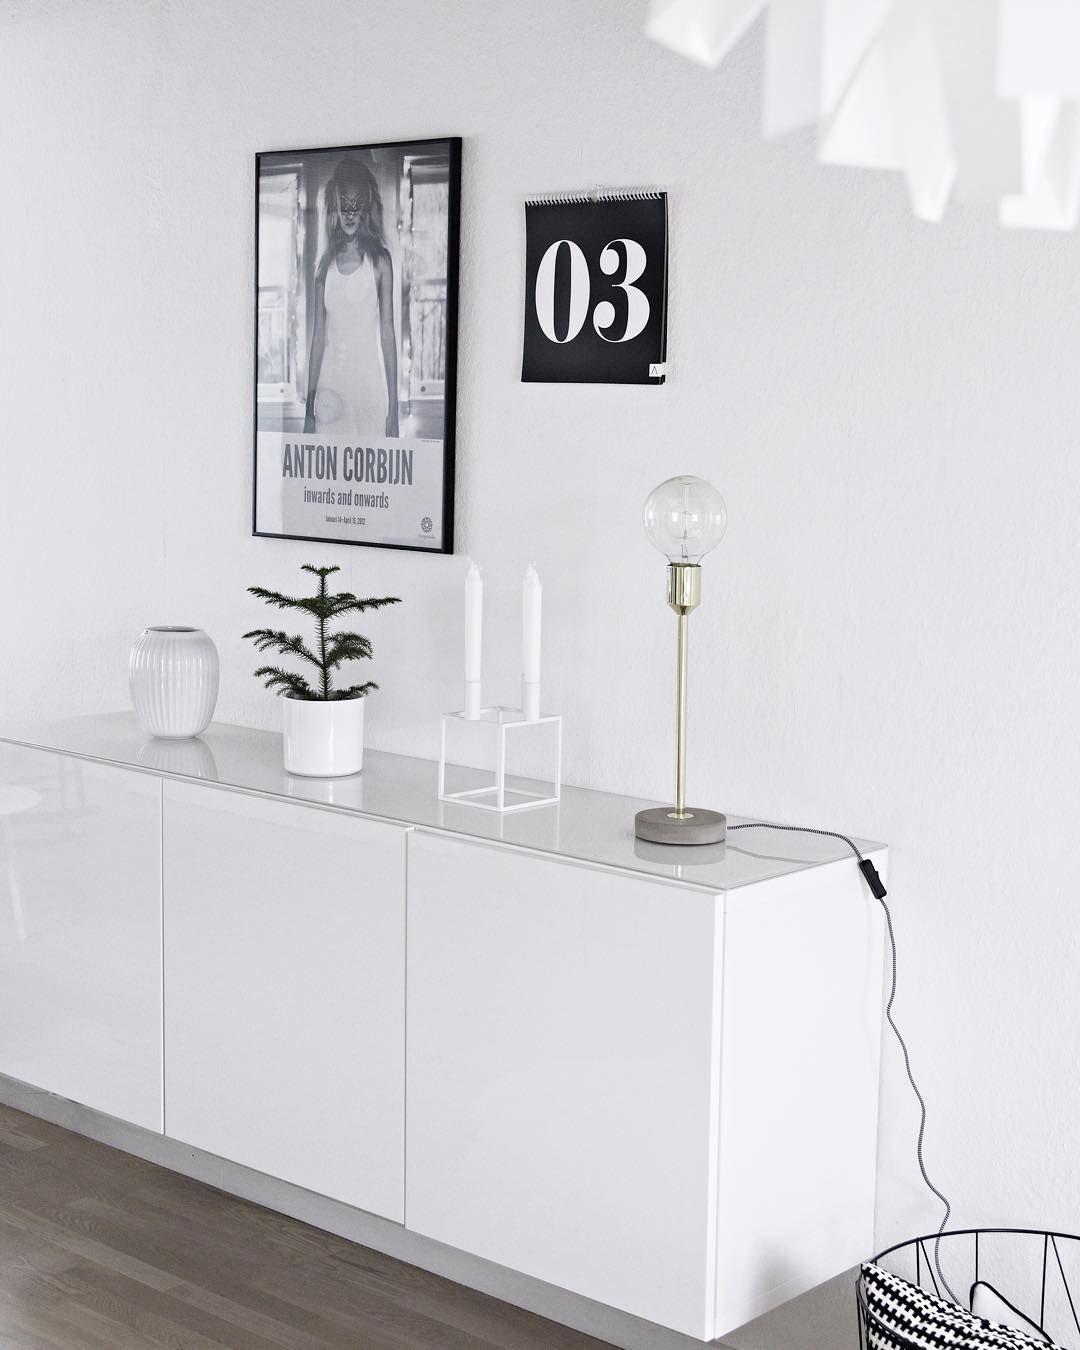 192 Synes Godt Om 8 Kommentarer Marketa Mitliversmukt Pa Instagram Just The Perfect Slowly Tuesday Afternoon Vscocam Monochr Home Decor Interior Home